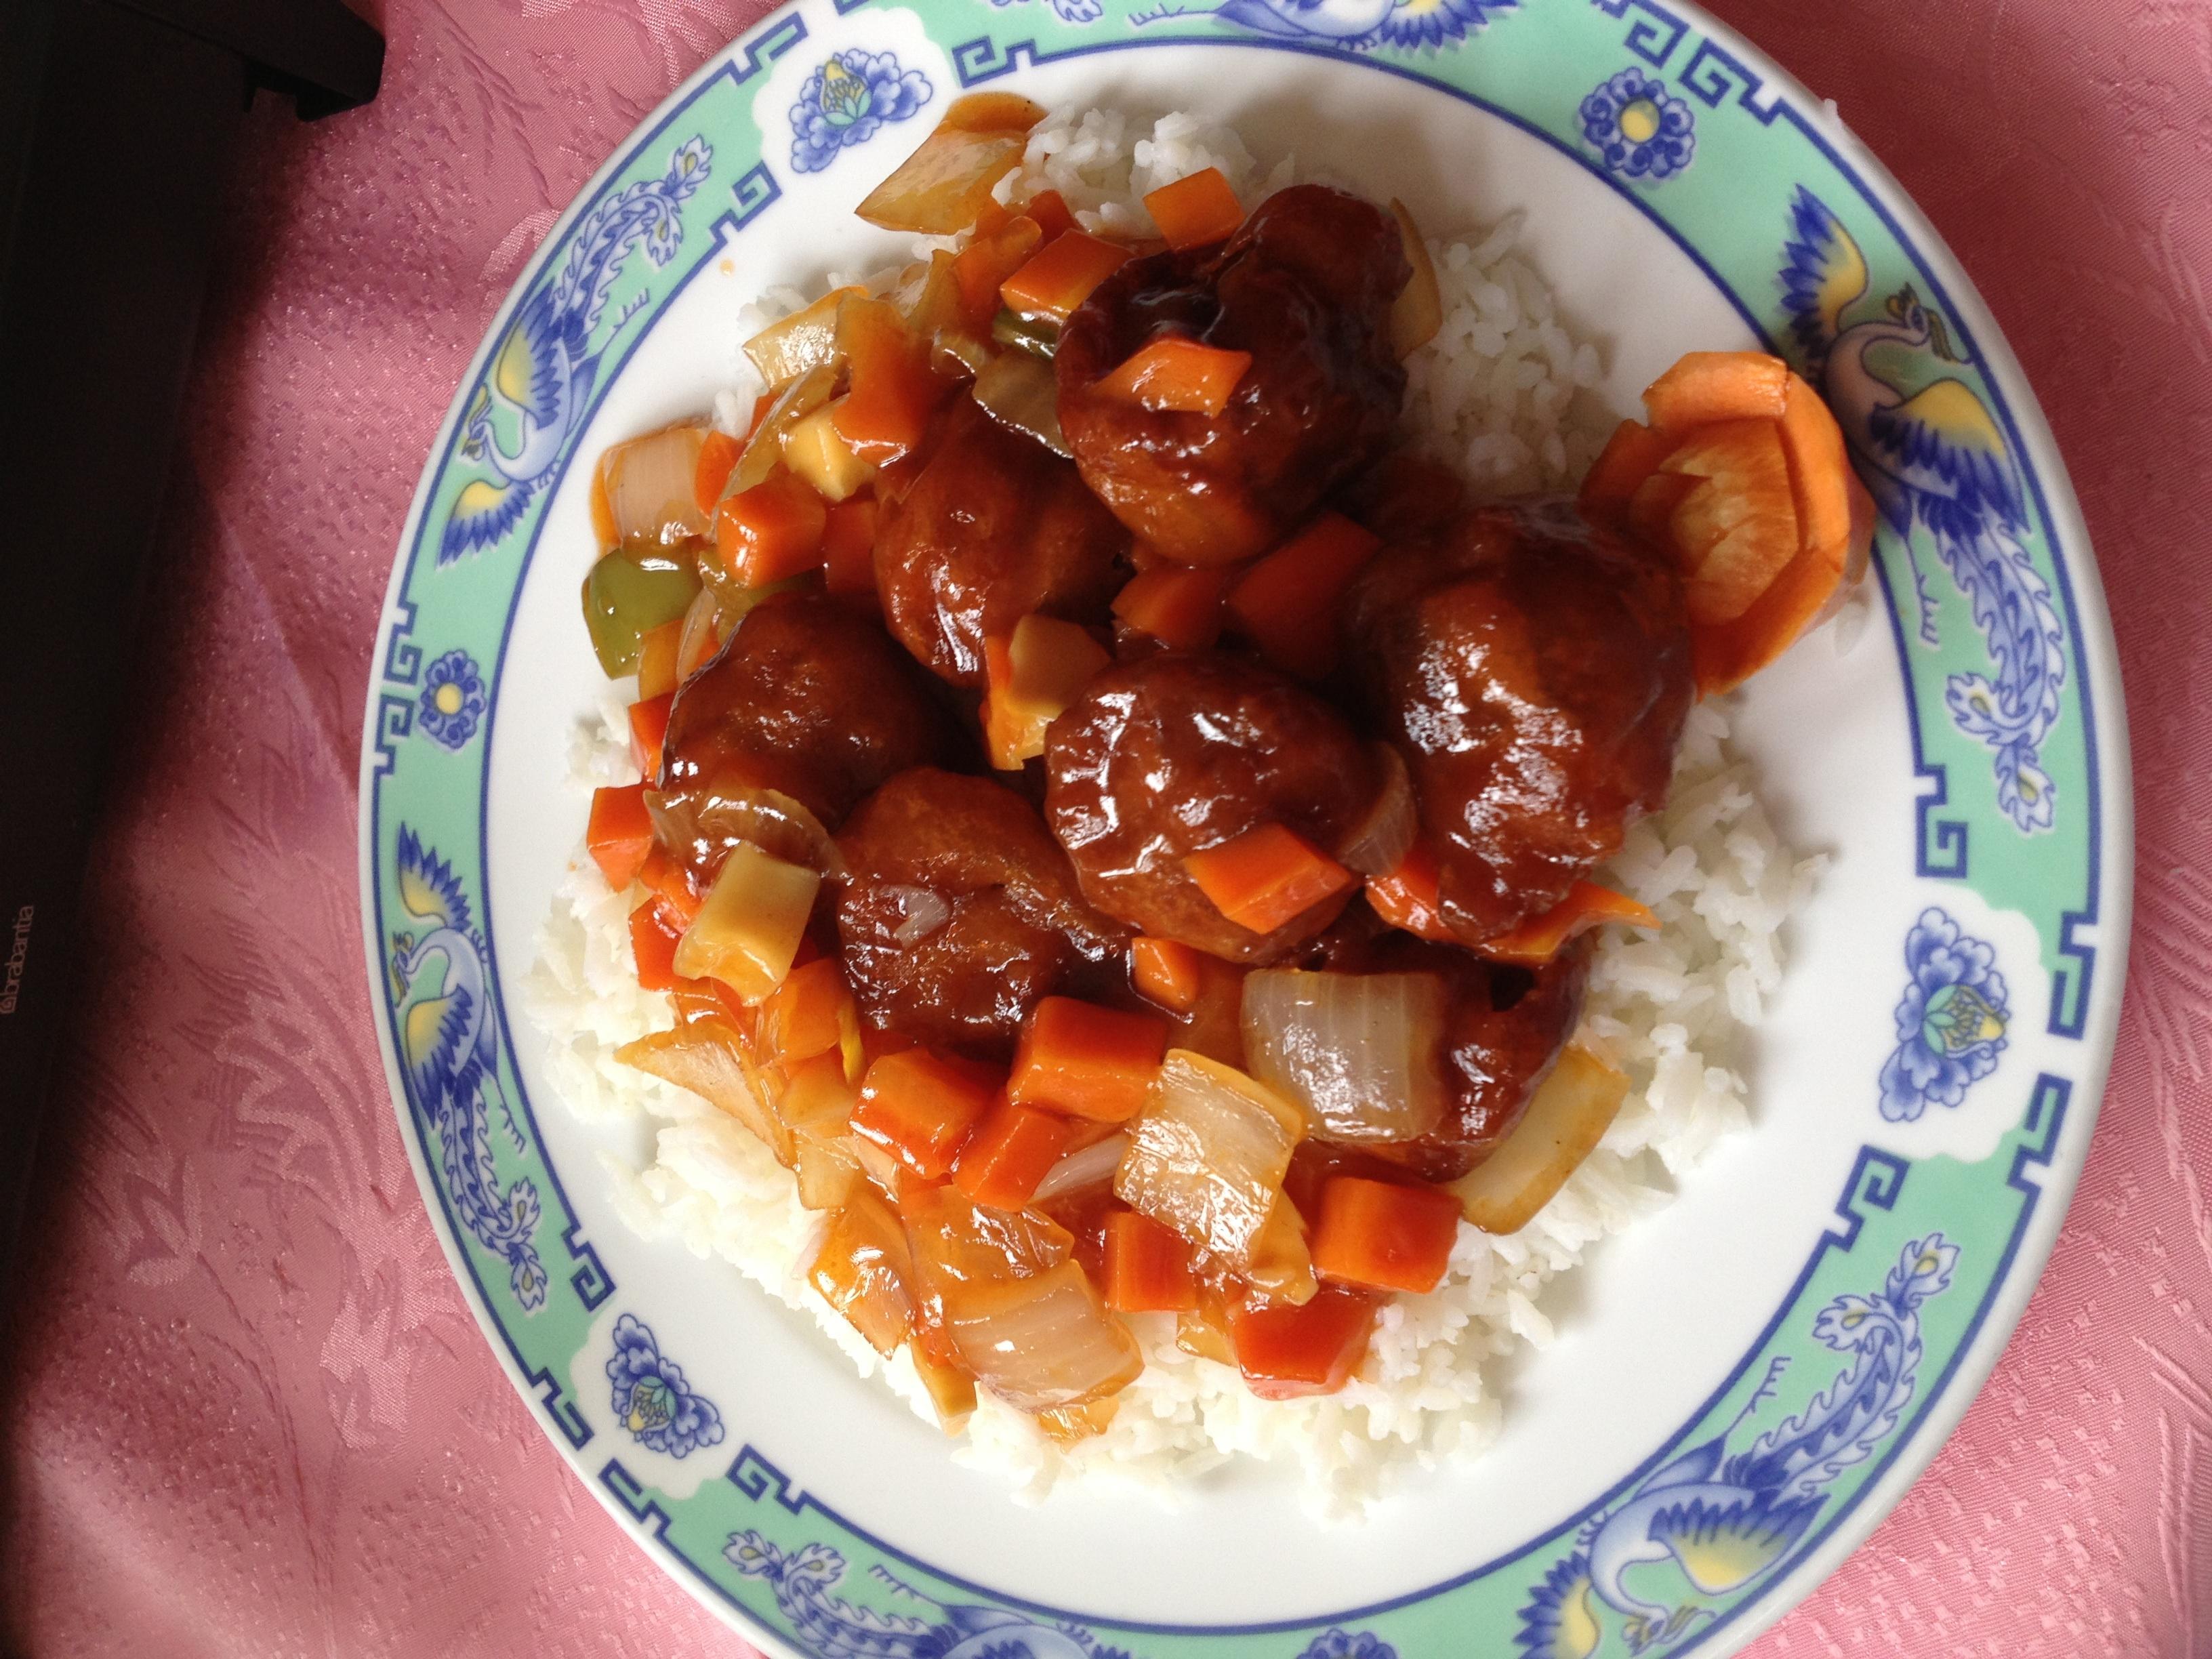 https://foodloader.net/BrollyLSSJ_2013-05-09_Sentosa_-_Schweinefleisch_gebacken_suess_sauer.jpg